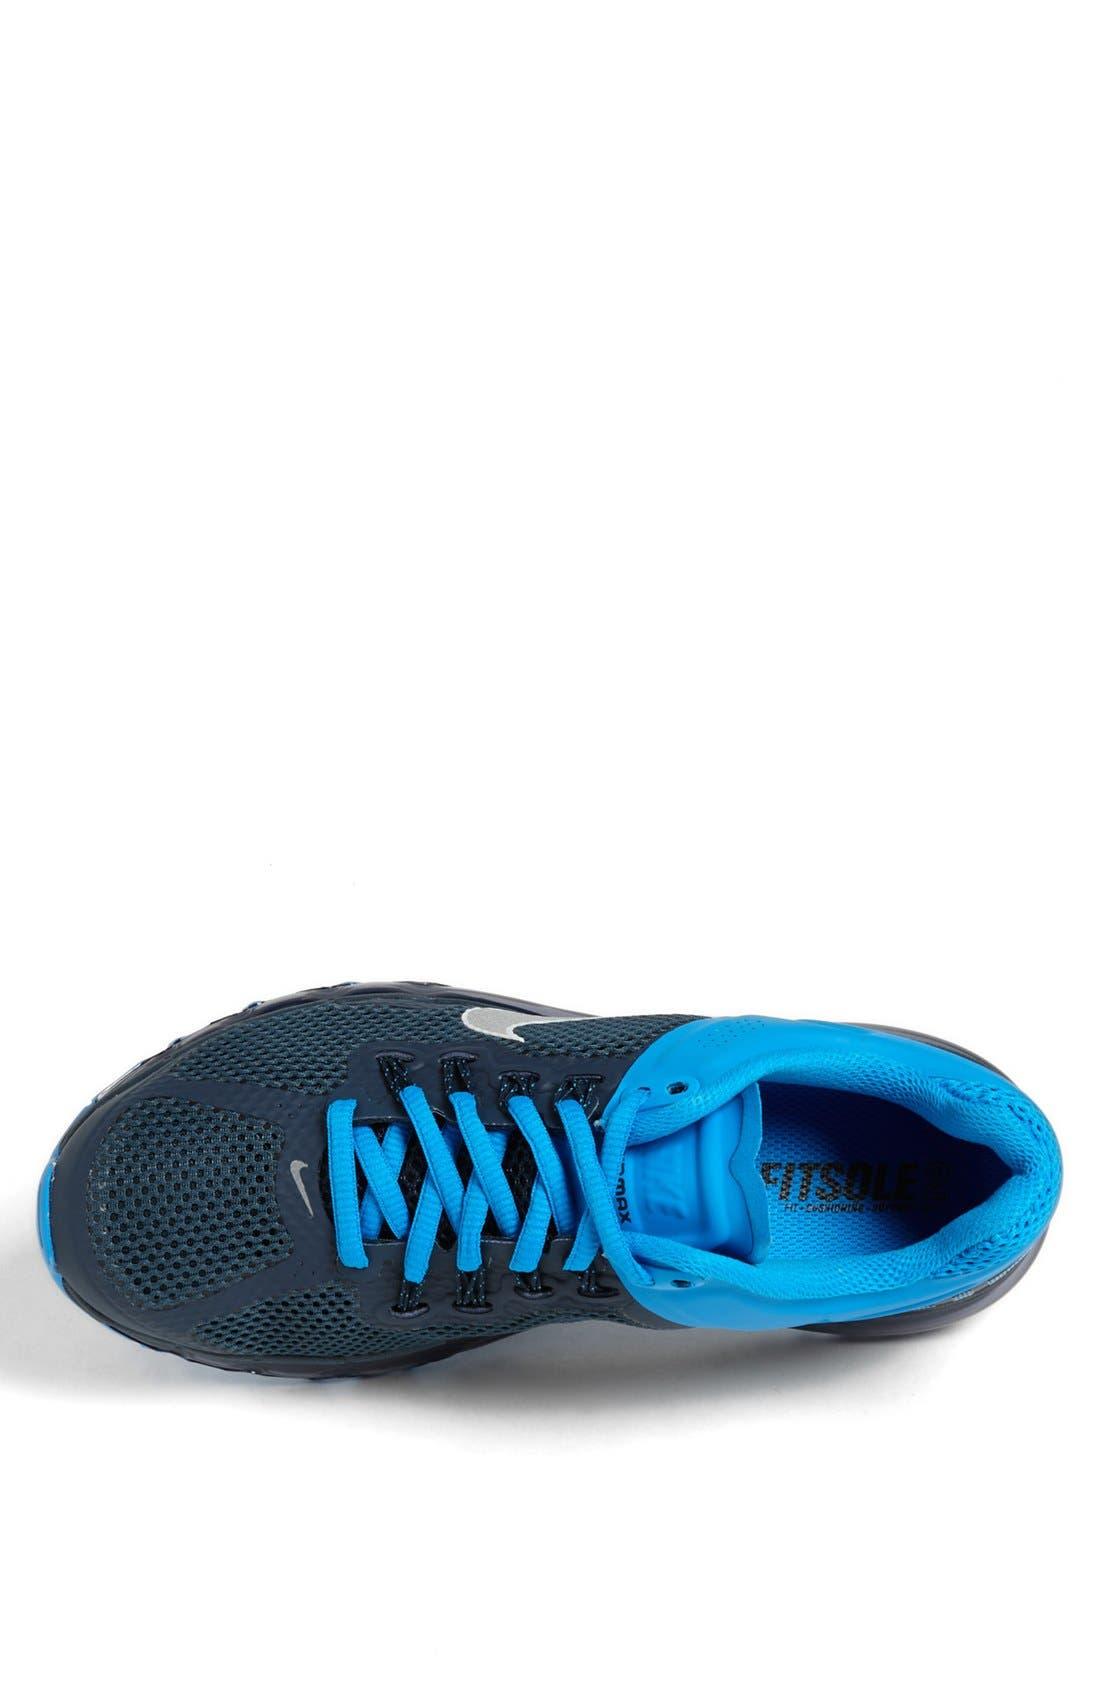 Alternate Image 3  - Nike 'Air Max+ 2013' Running Shoe (Men)